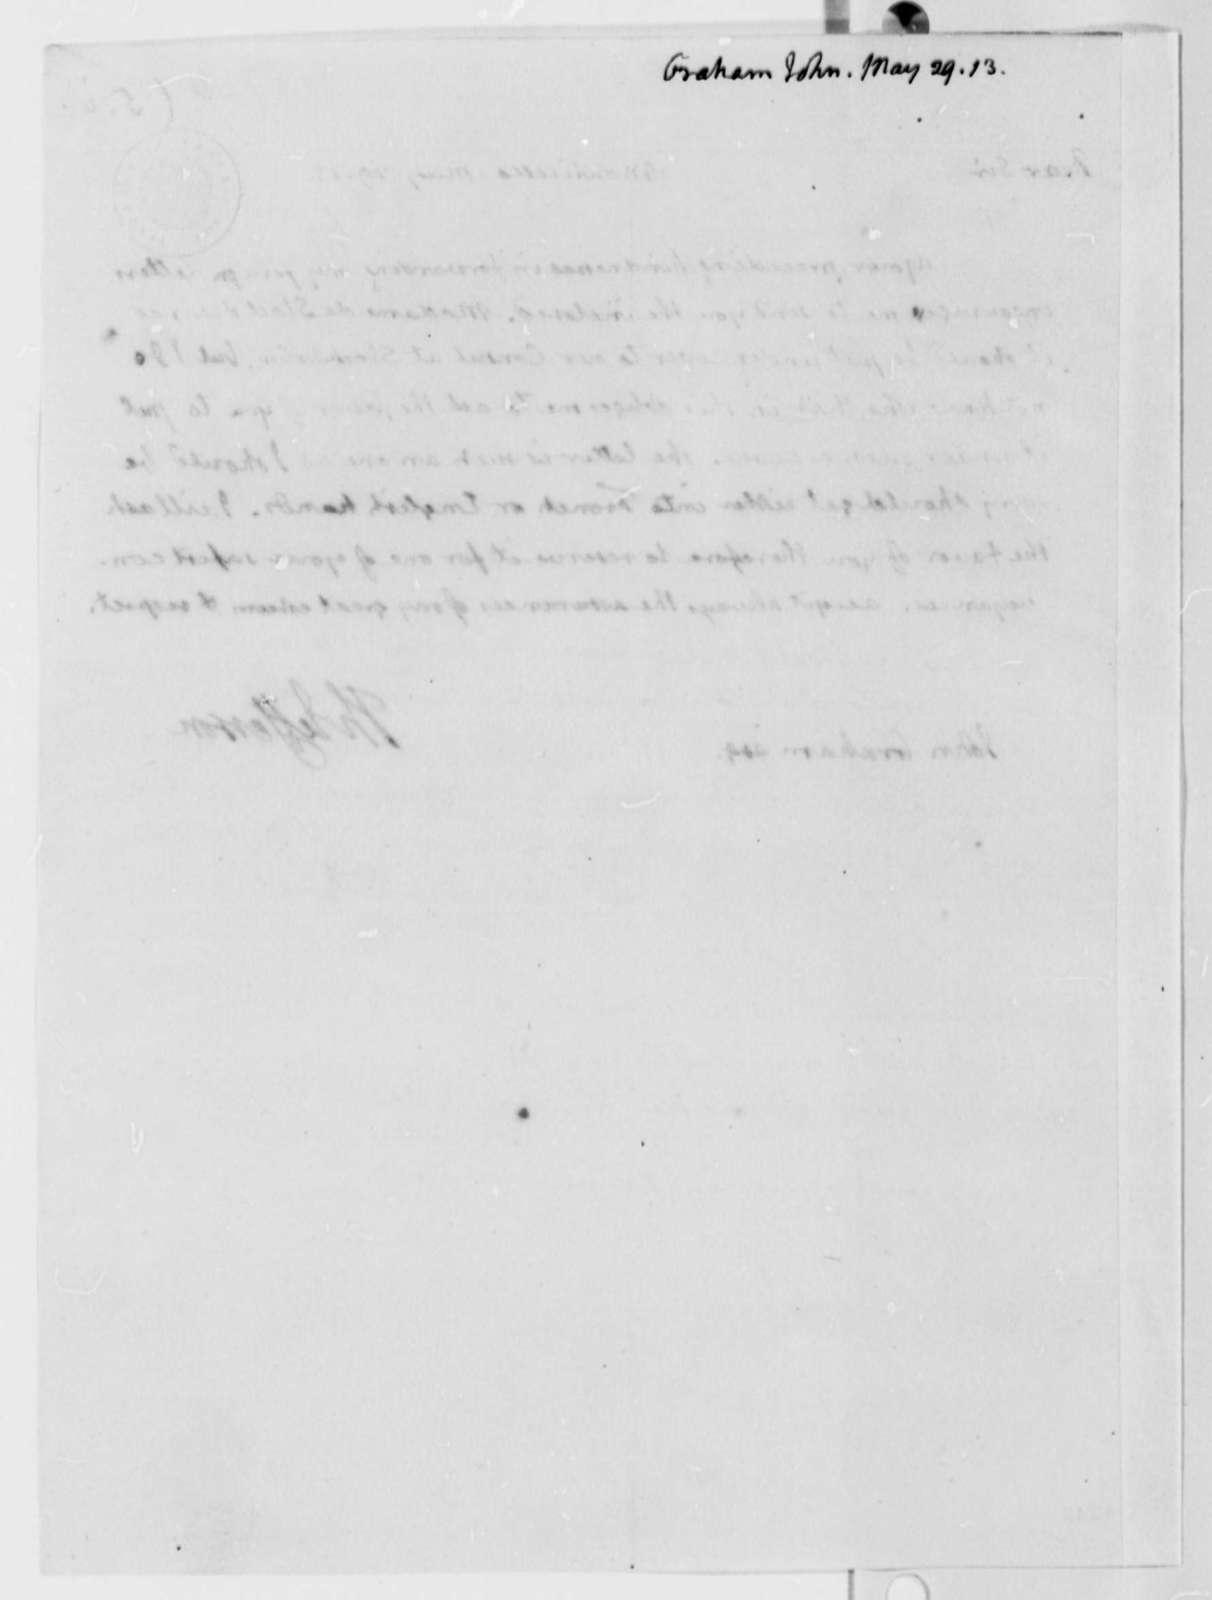 Thomas Jefferson to John A. Graham, May 29, 1813